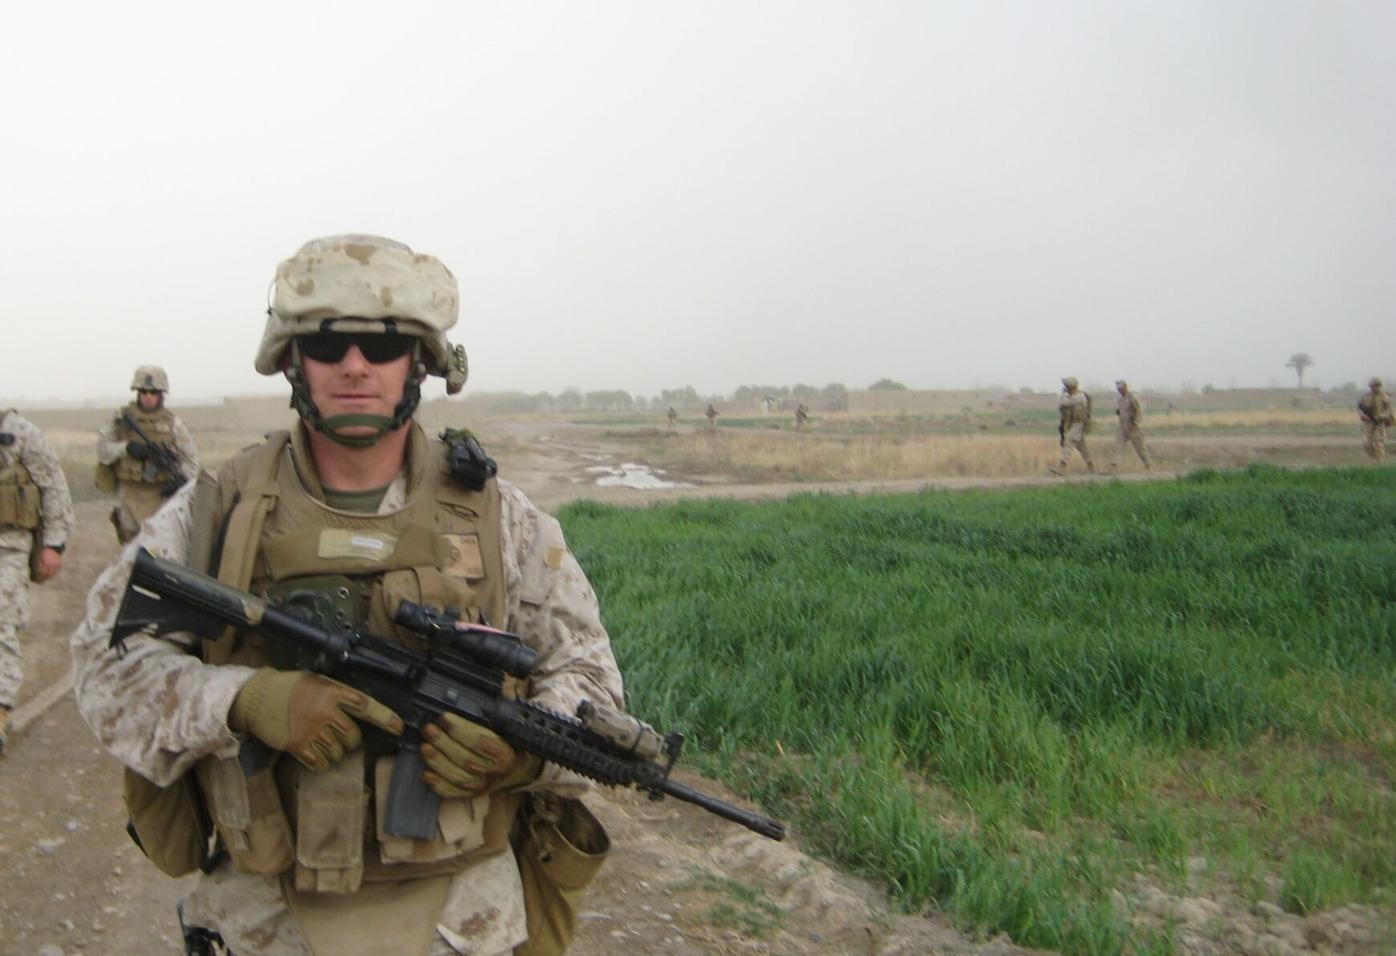 Steve Schultze in uniform holding a gun